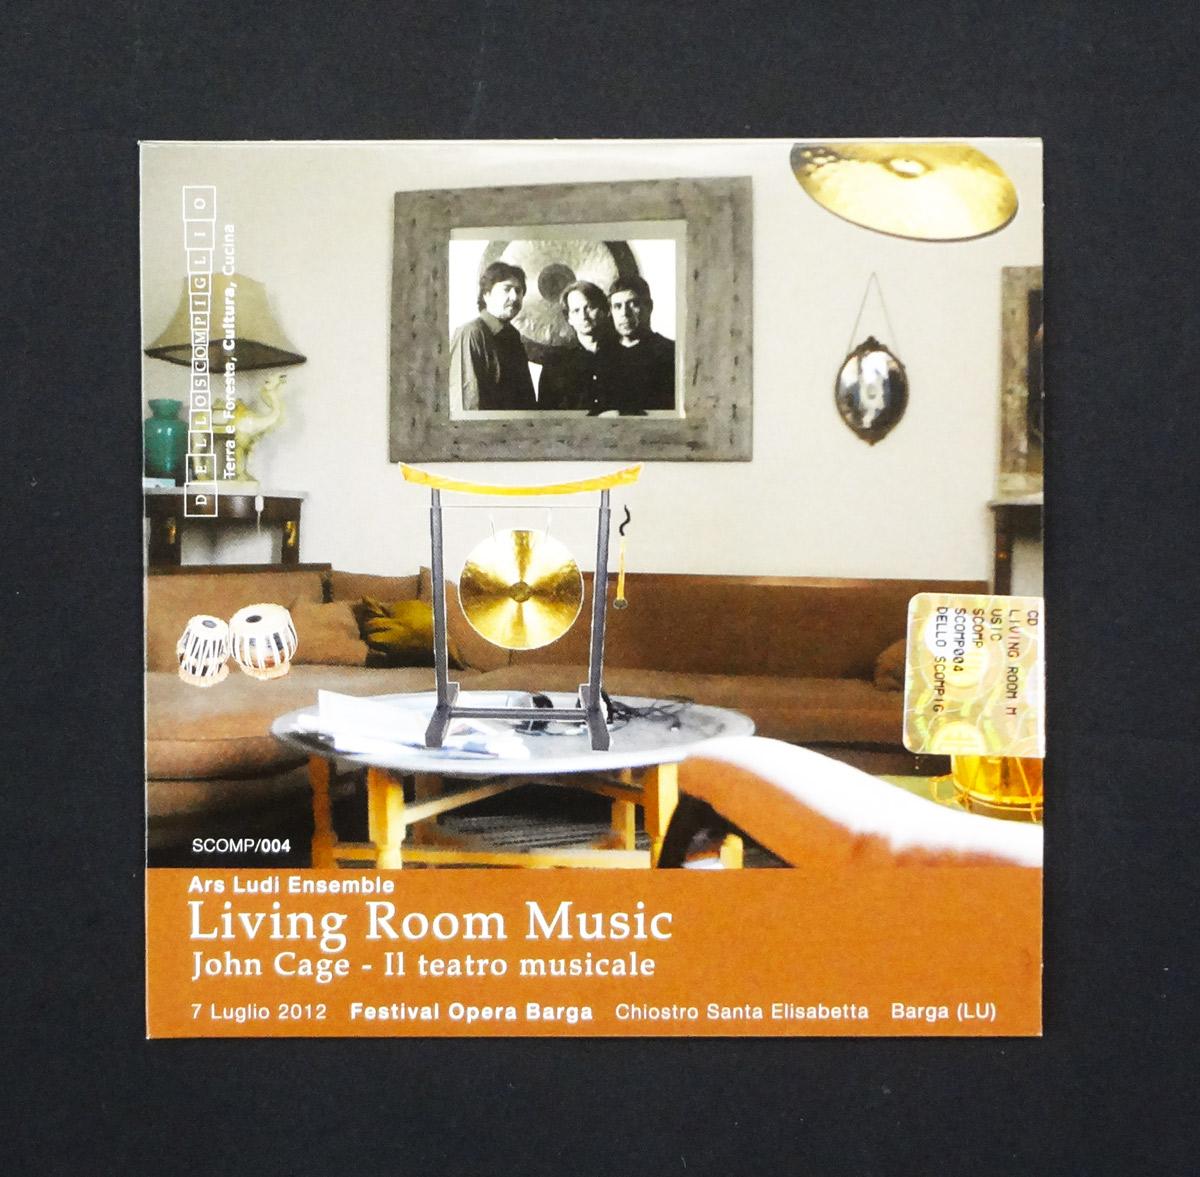 Living Room Music · Living Room Song: FONDAZIONE BONOTTO